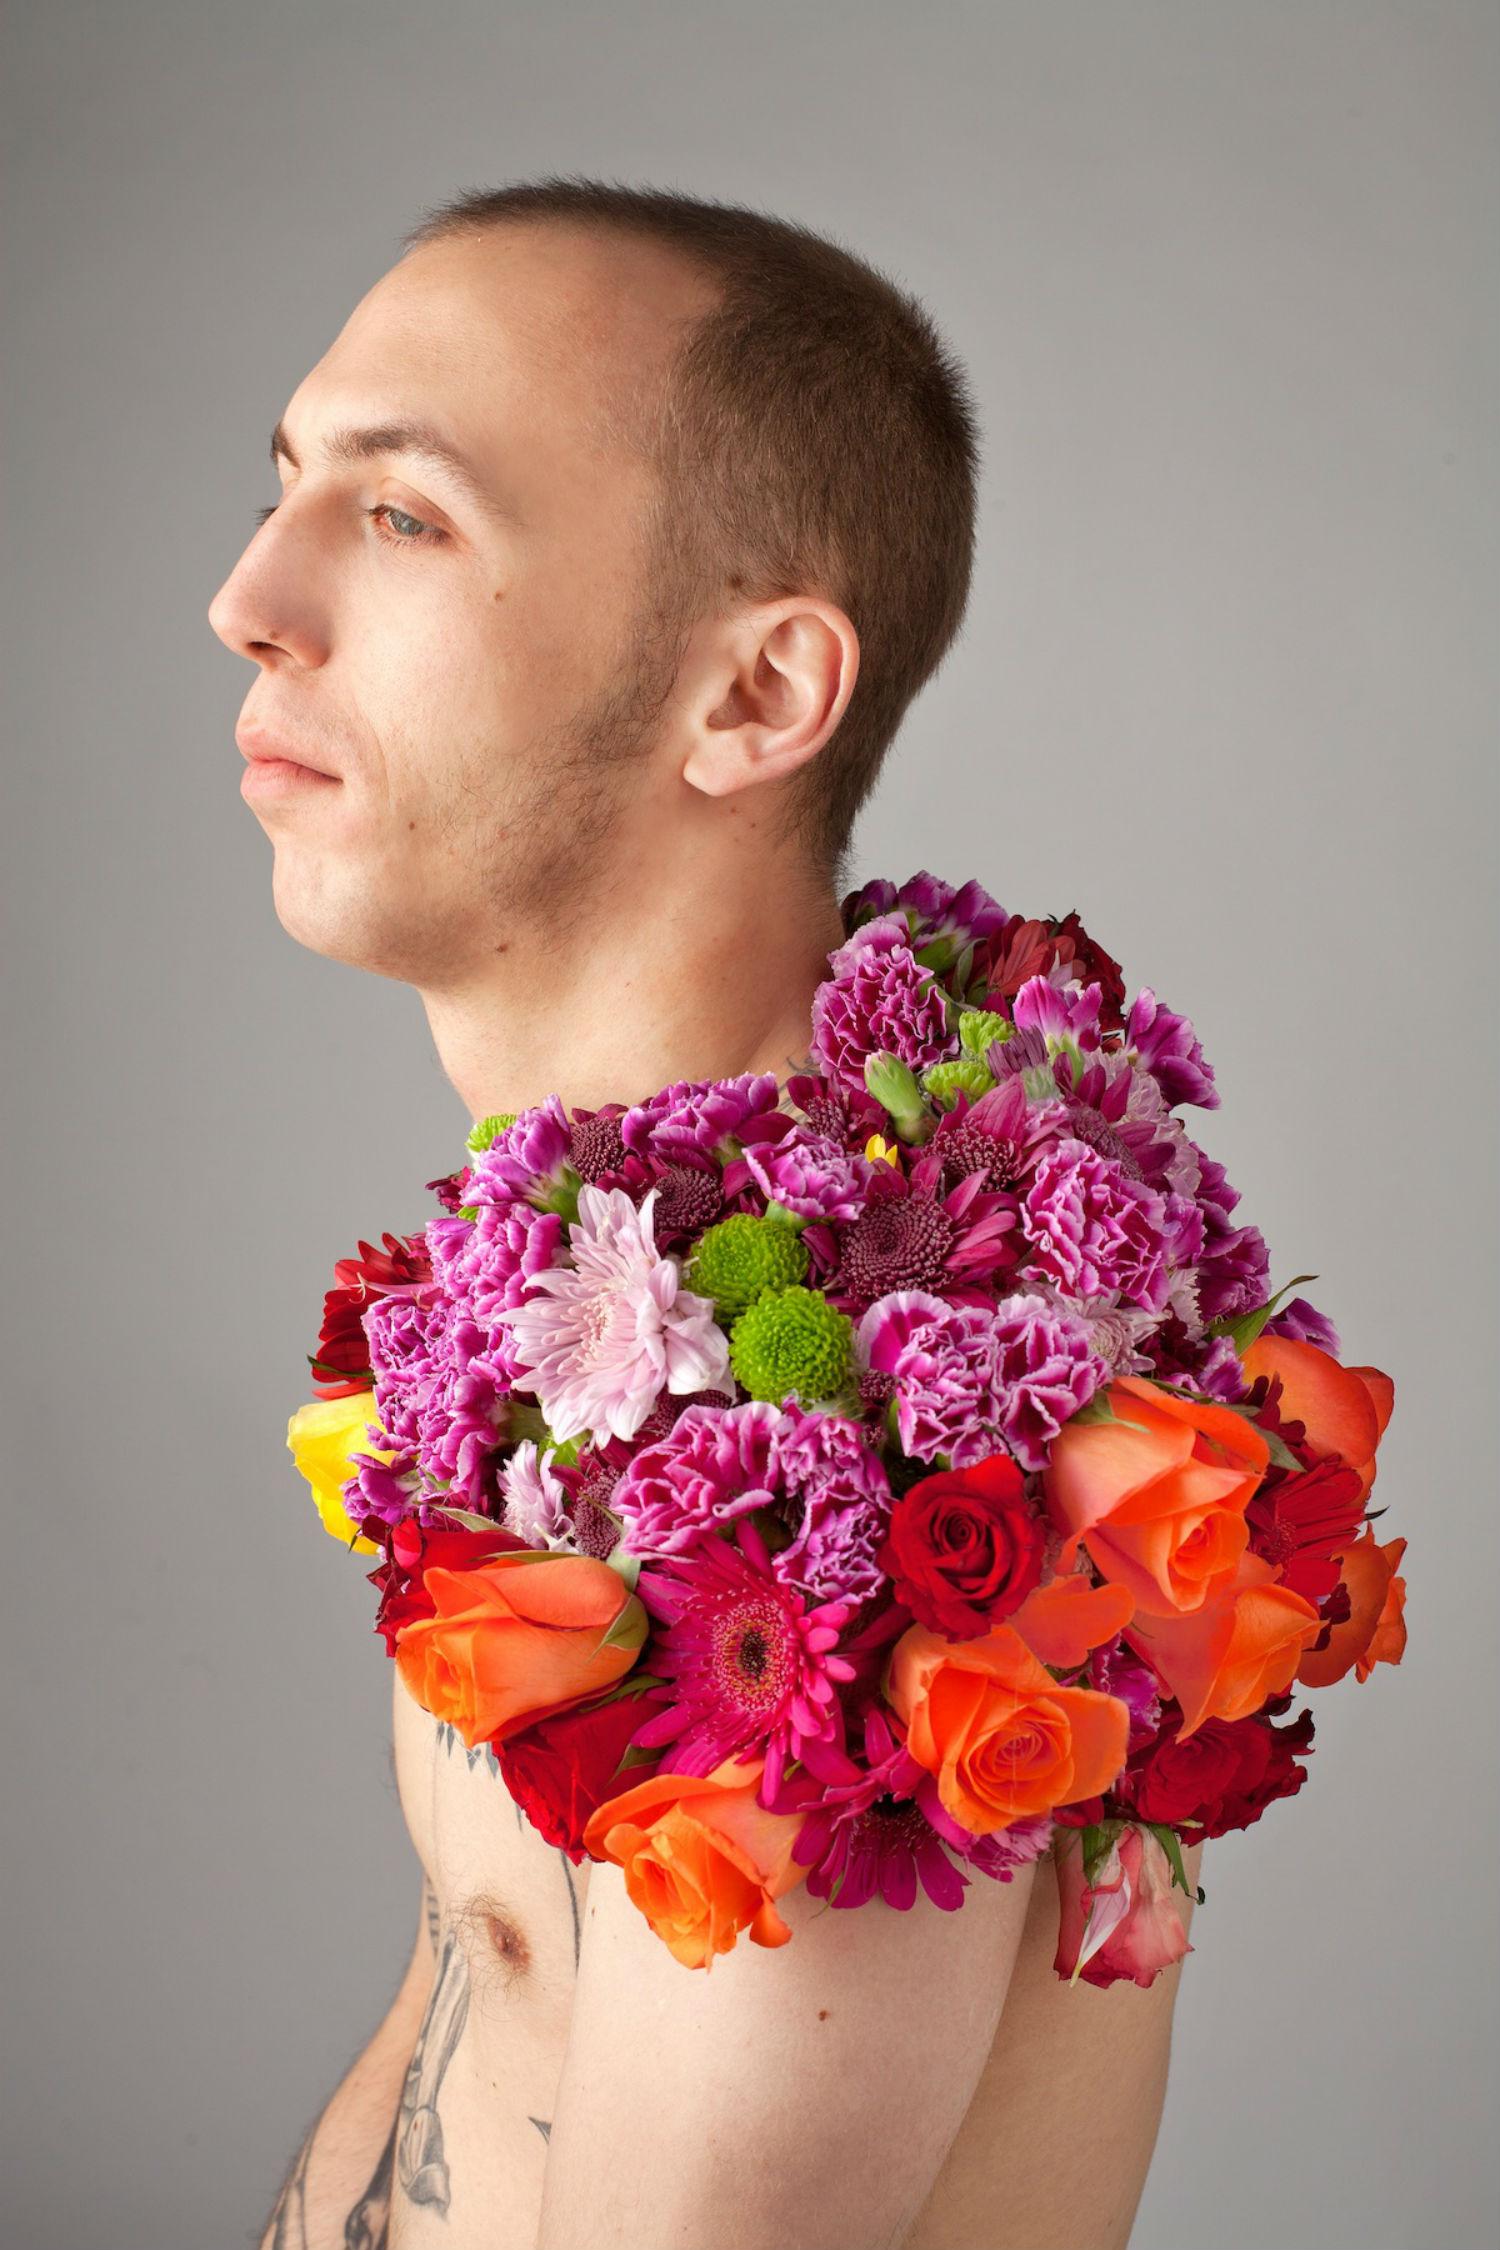 aleksandro king flowers boys photography